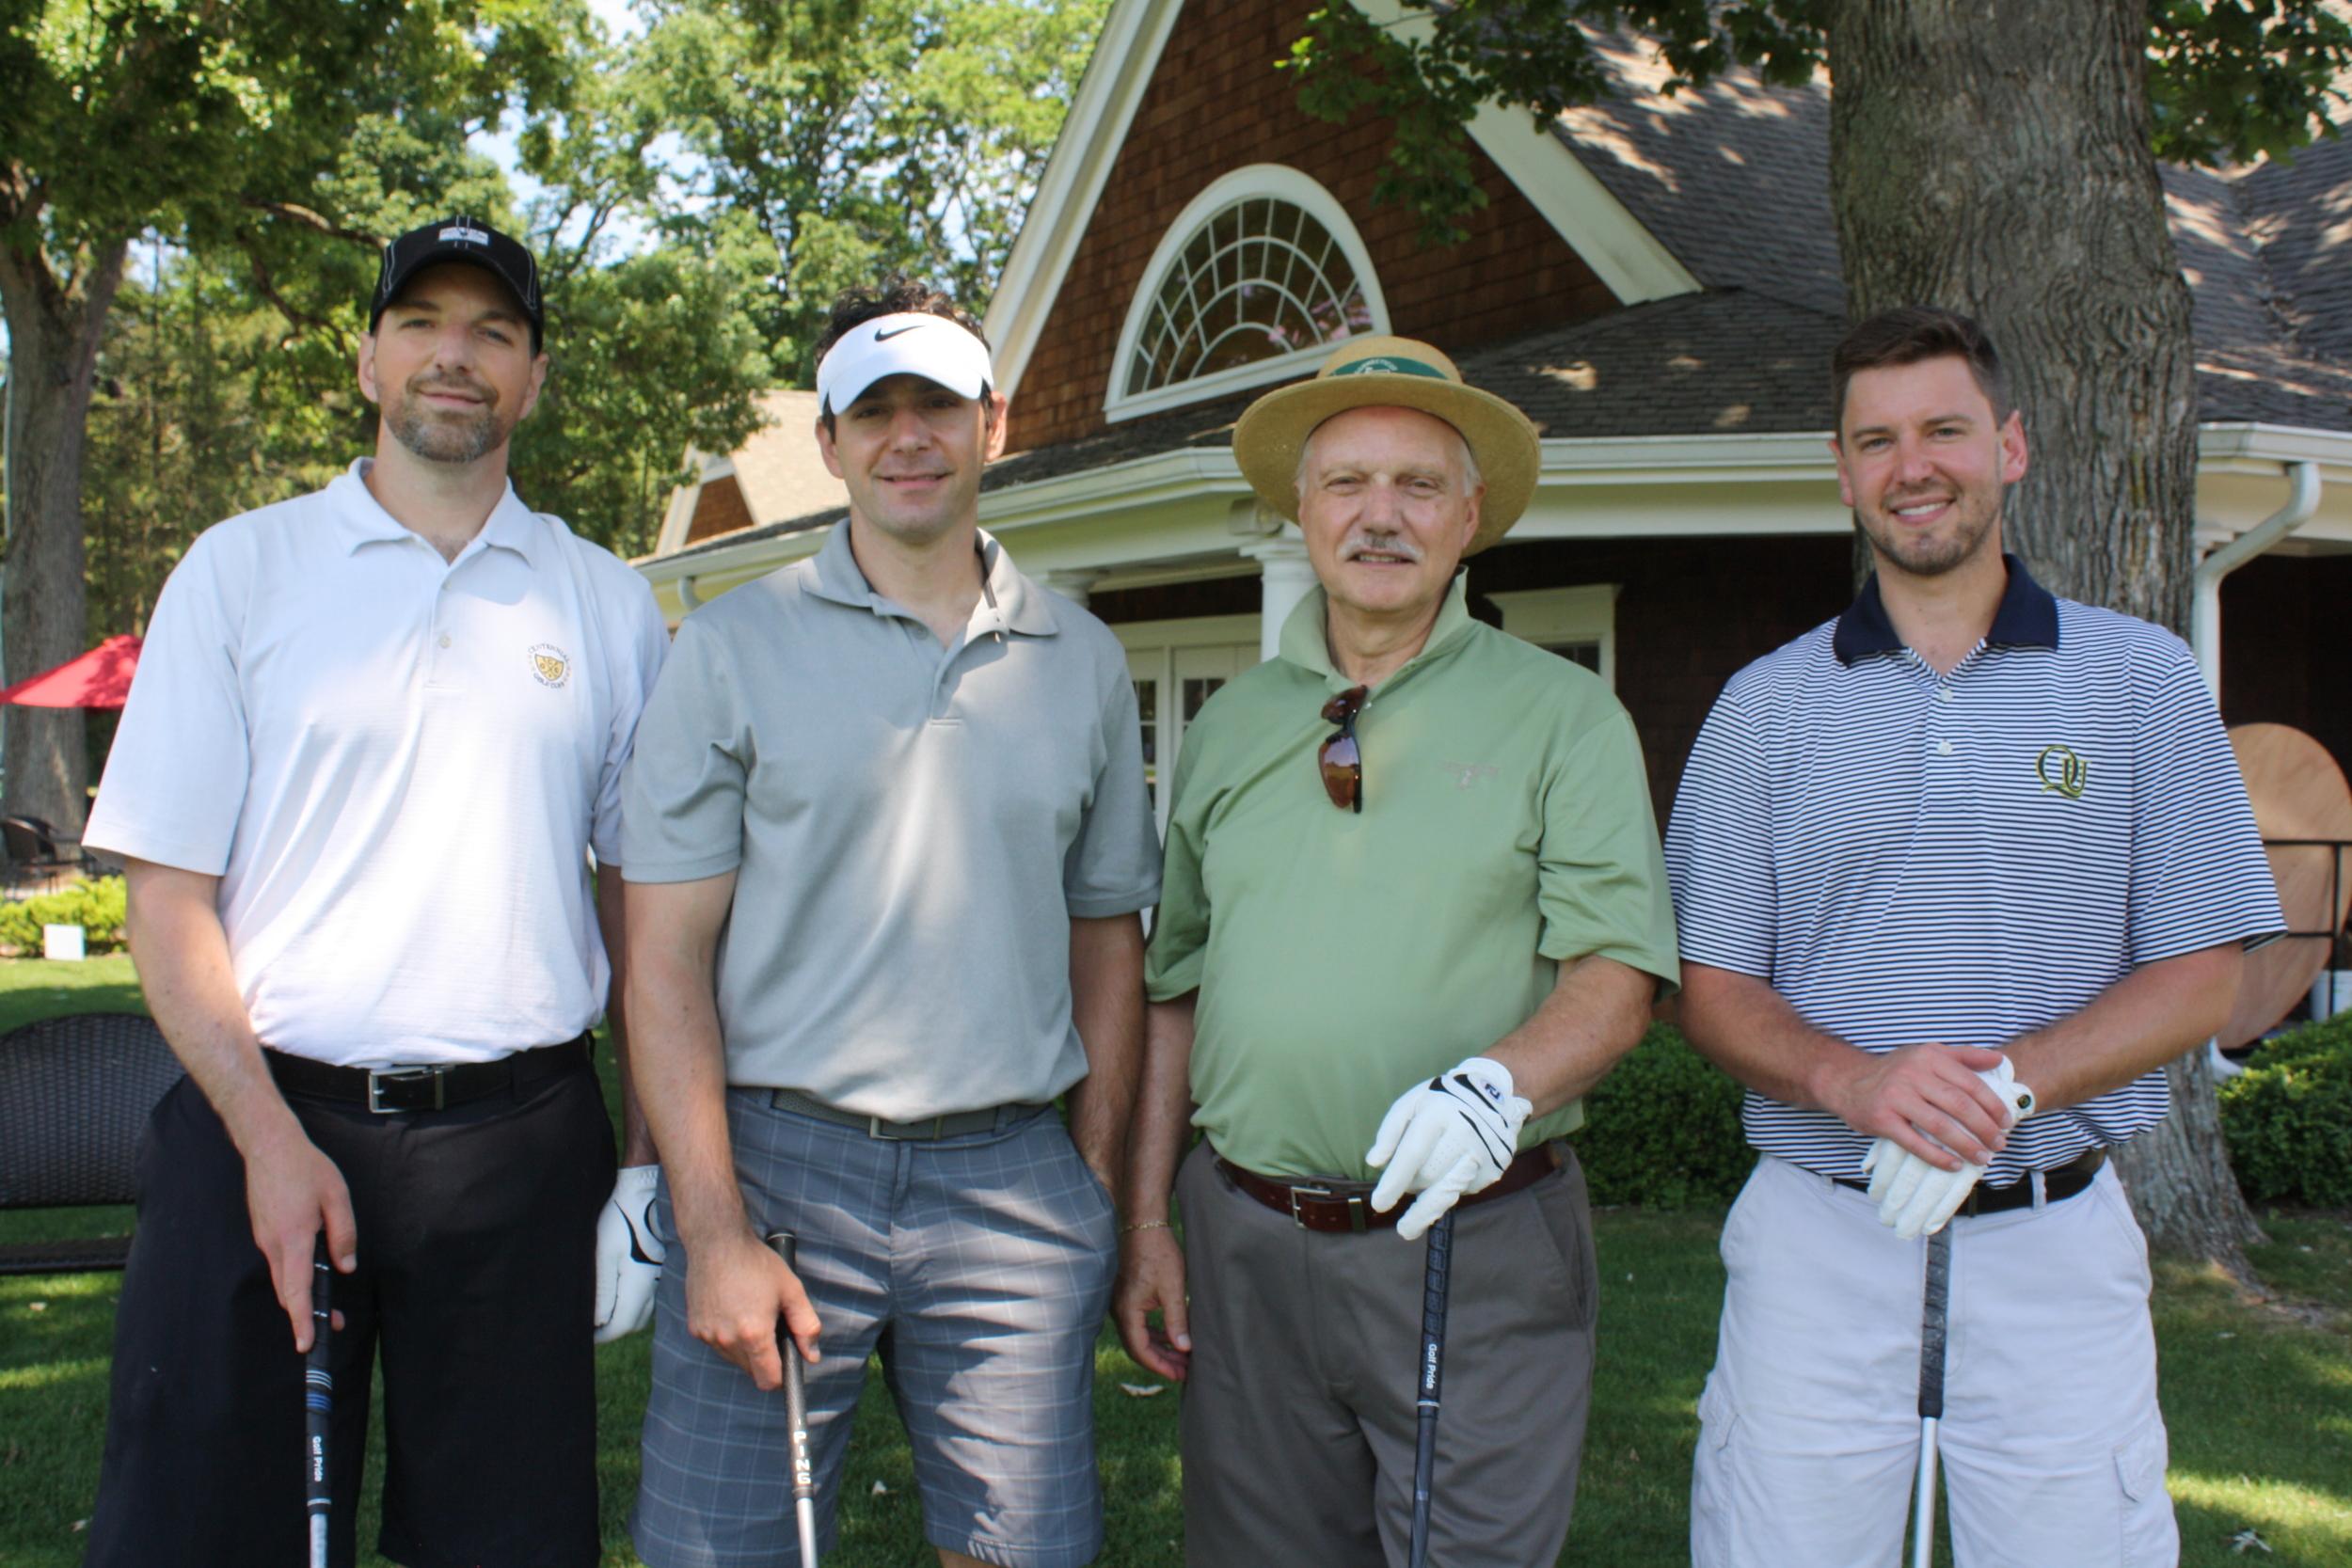 2 Chris D'Amico, Matt D'Amico, Peter D'Amico Robin Schuppert.JPG